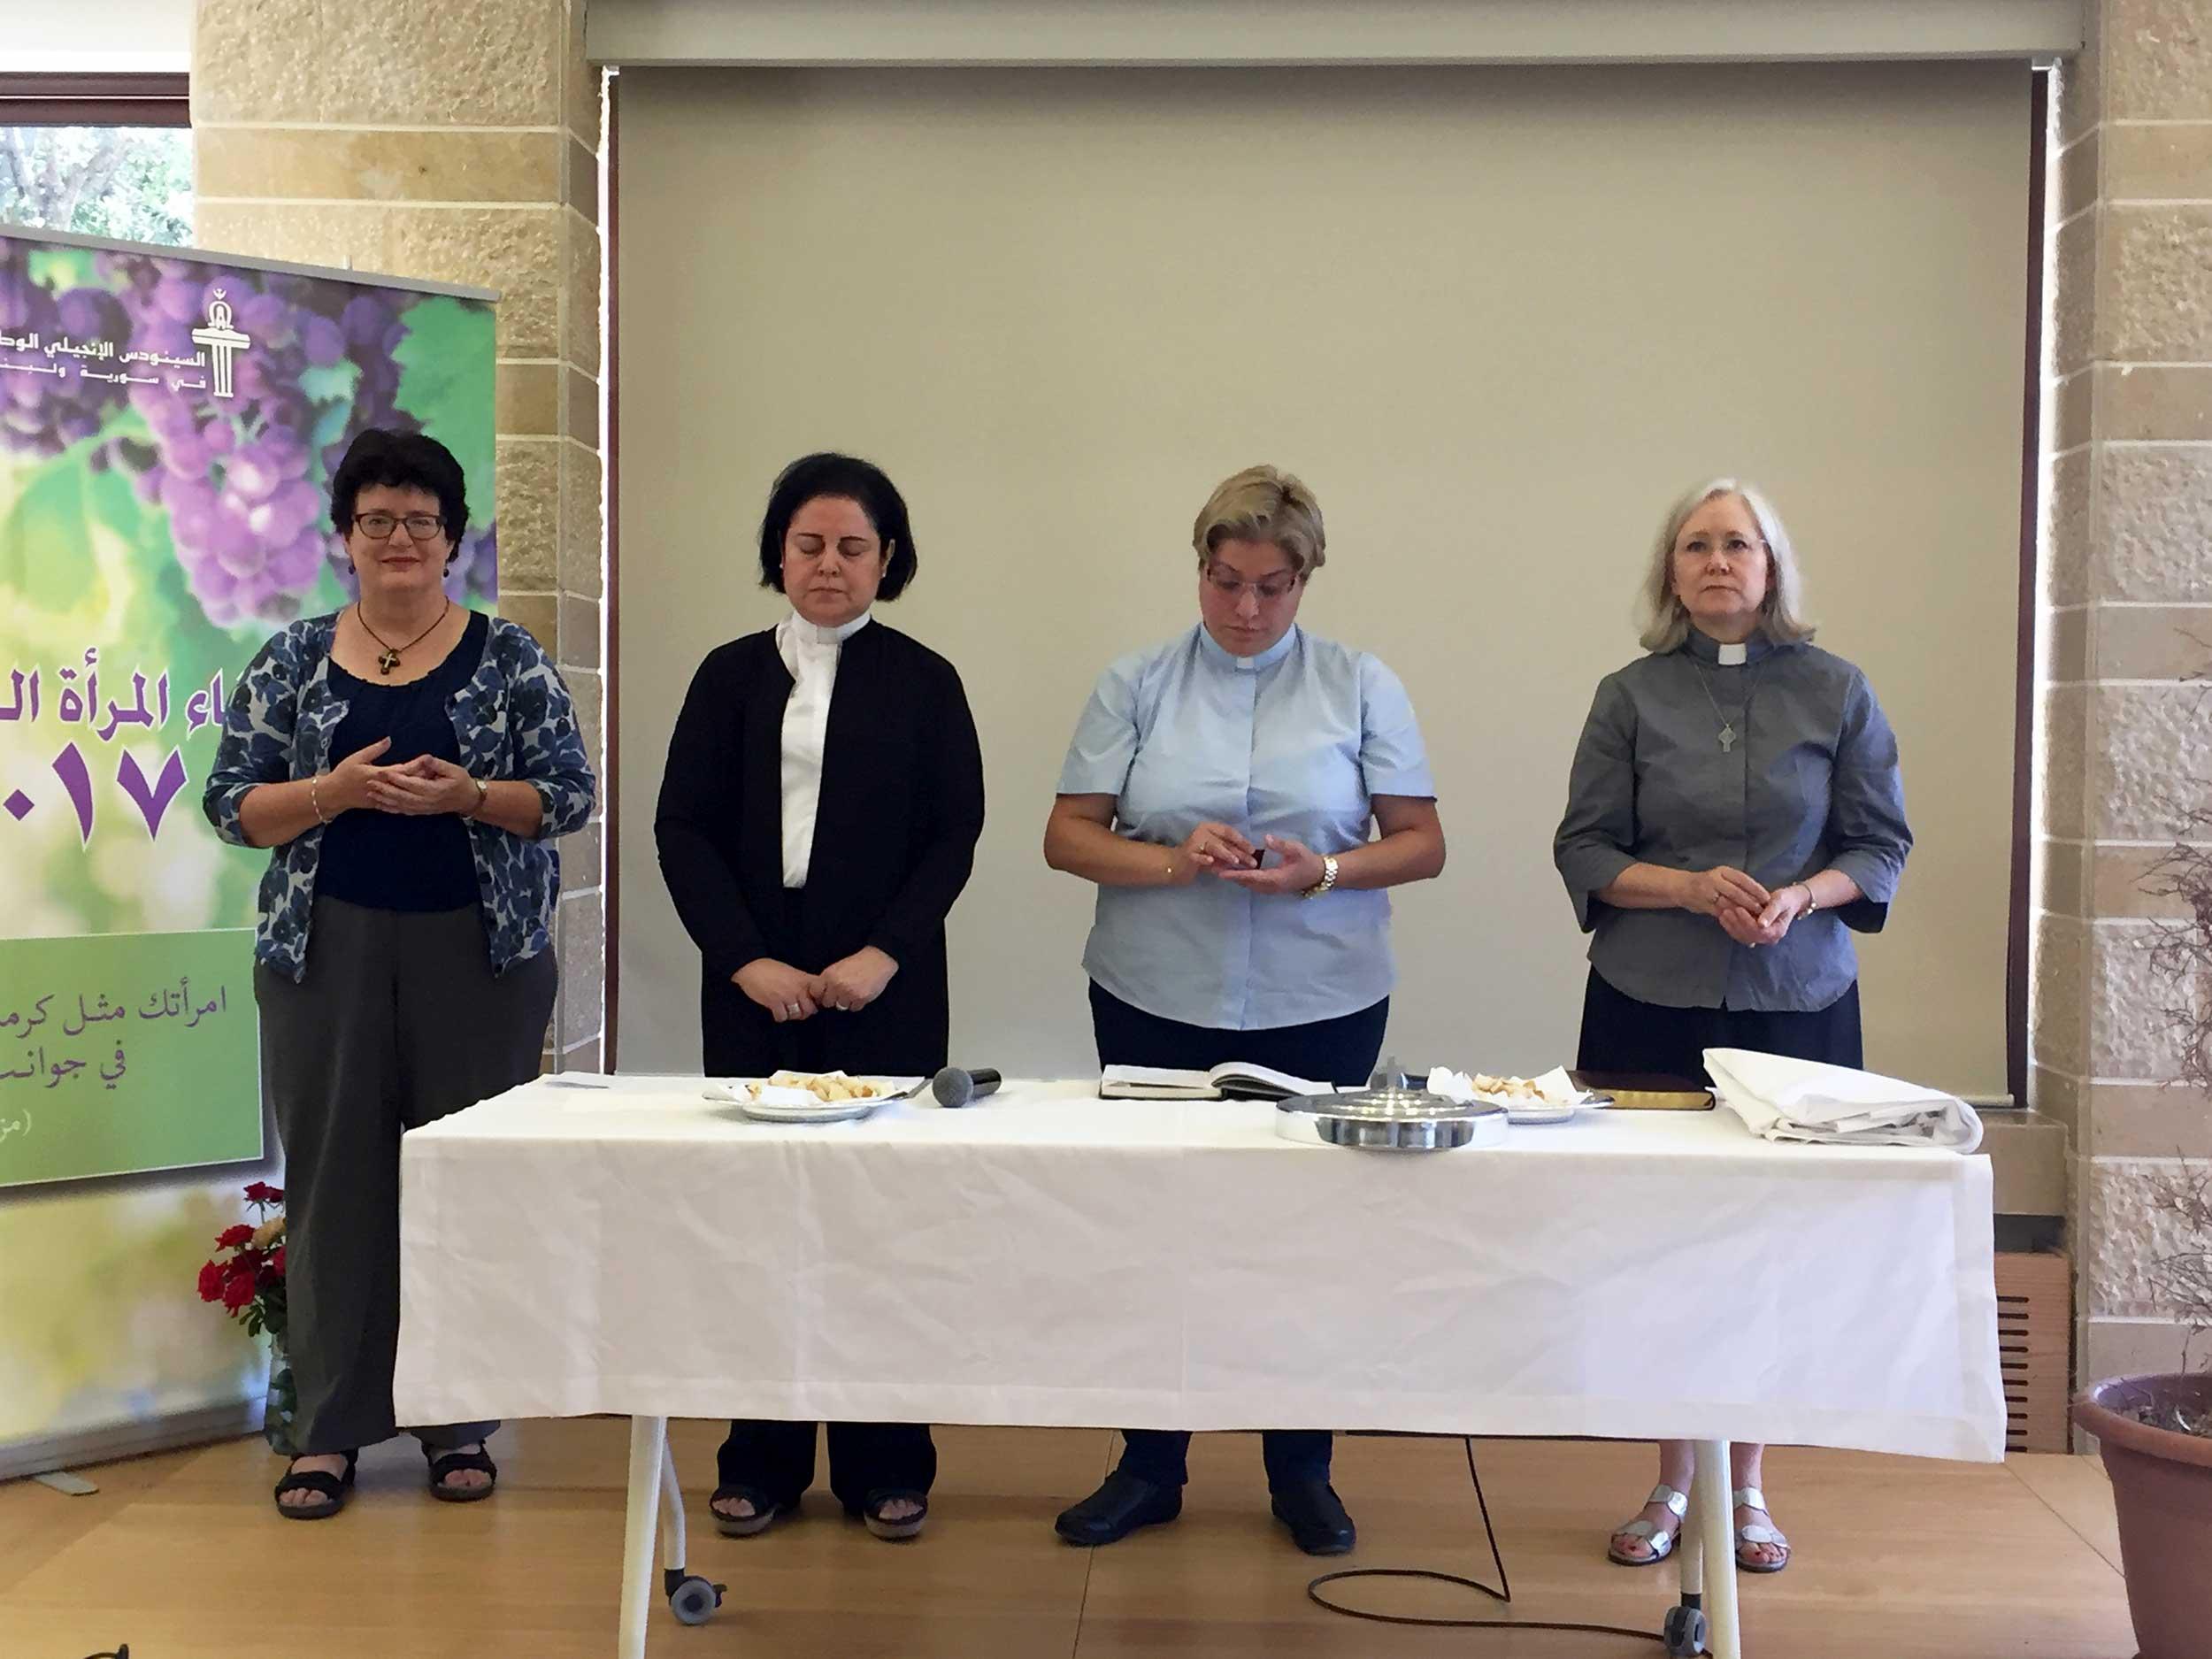 Revs Mary Beth, Najla, Rola, and Nancy